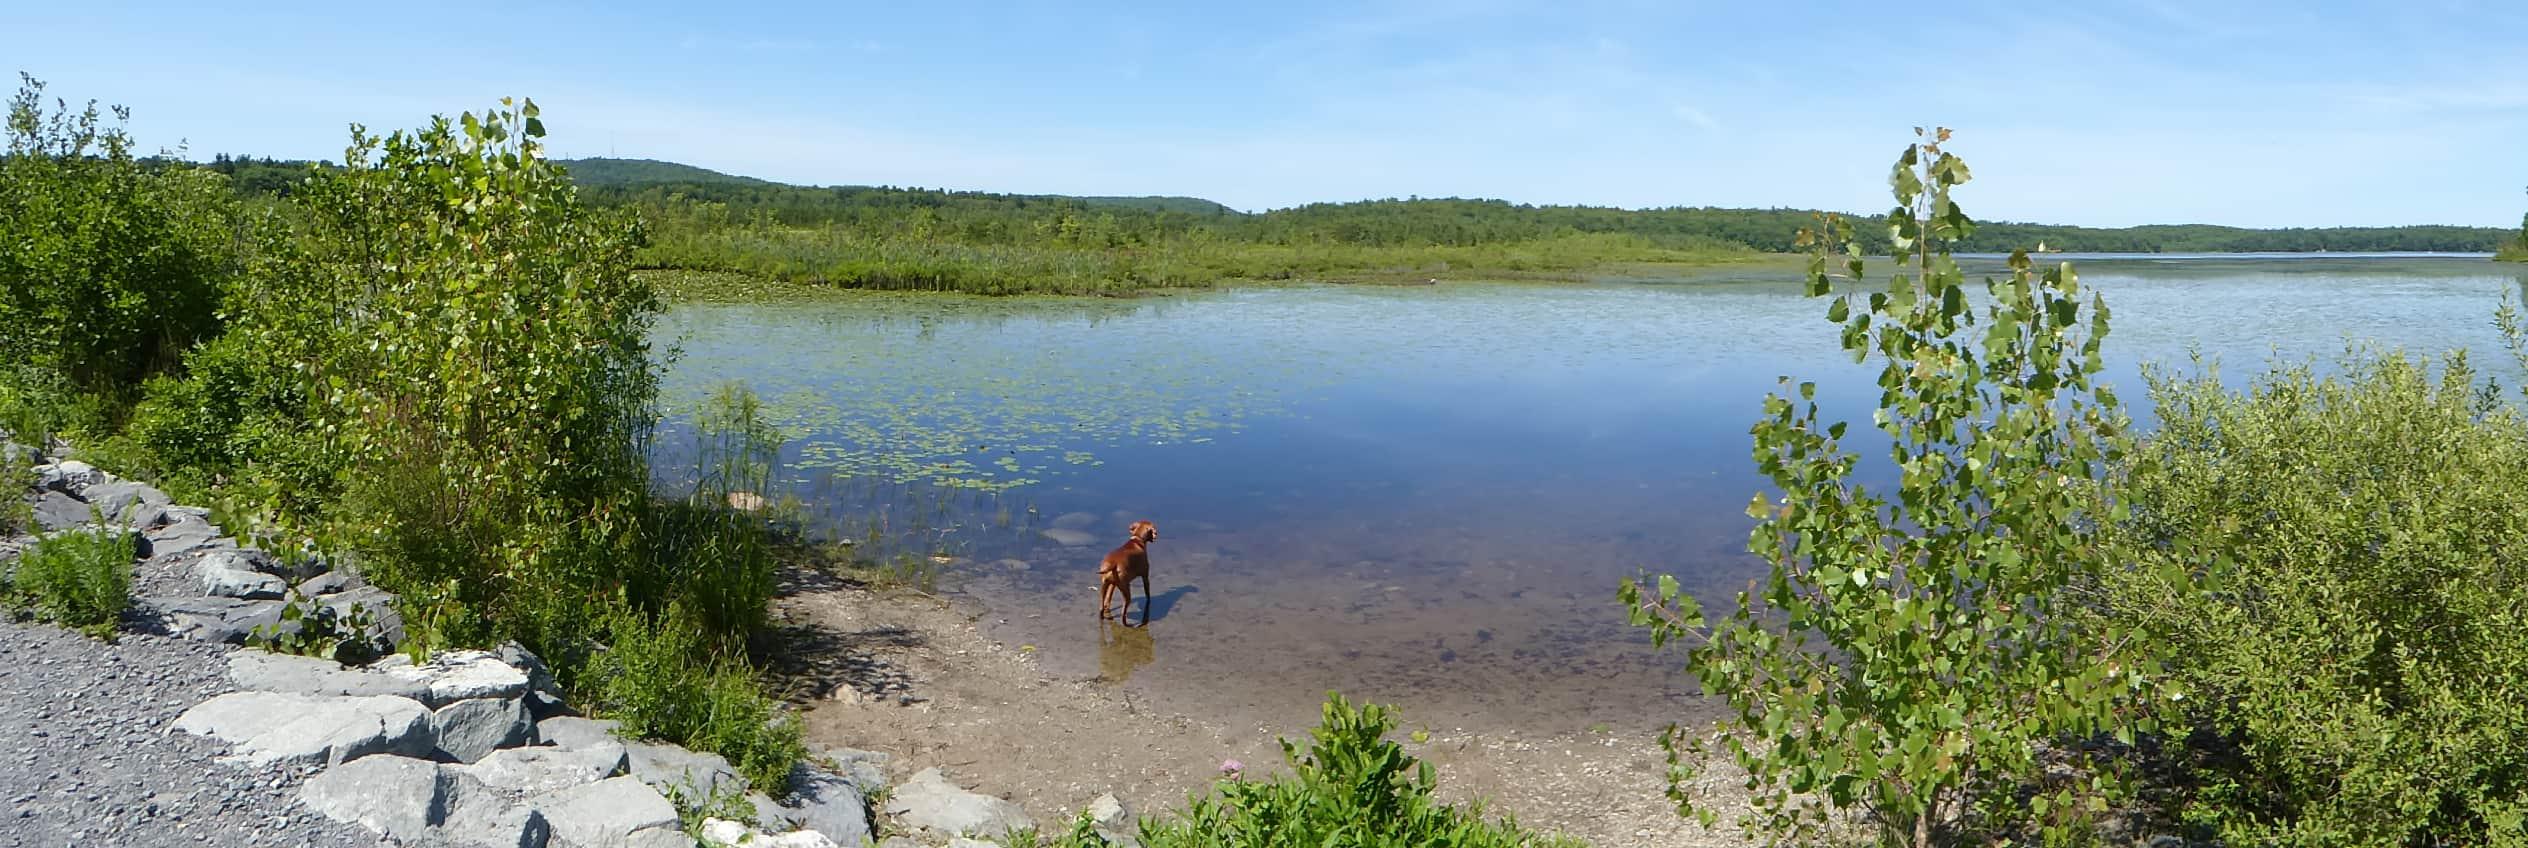 summer day at ponkapoag pond